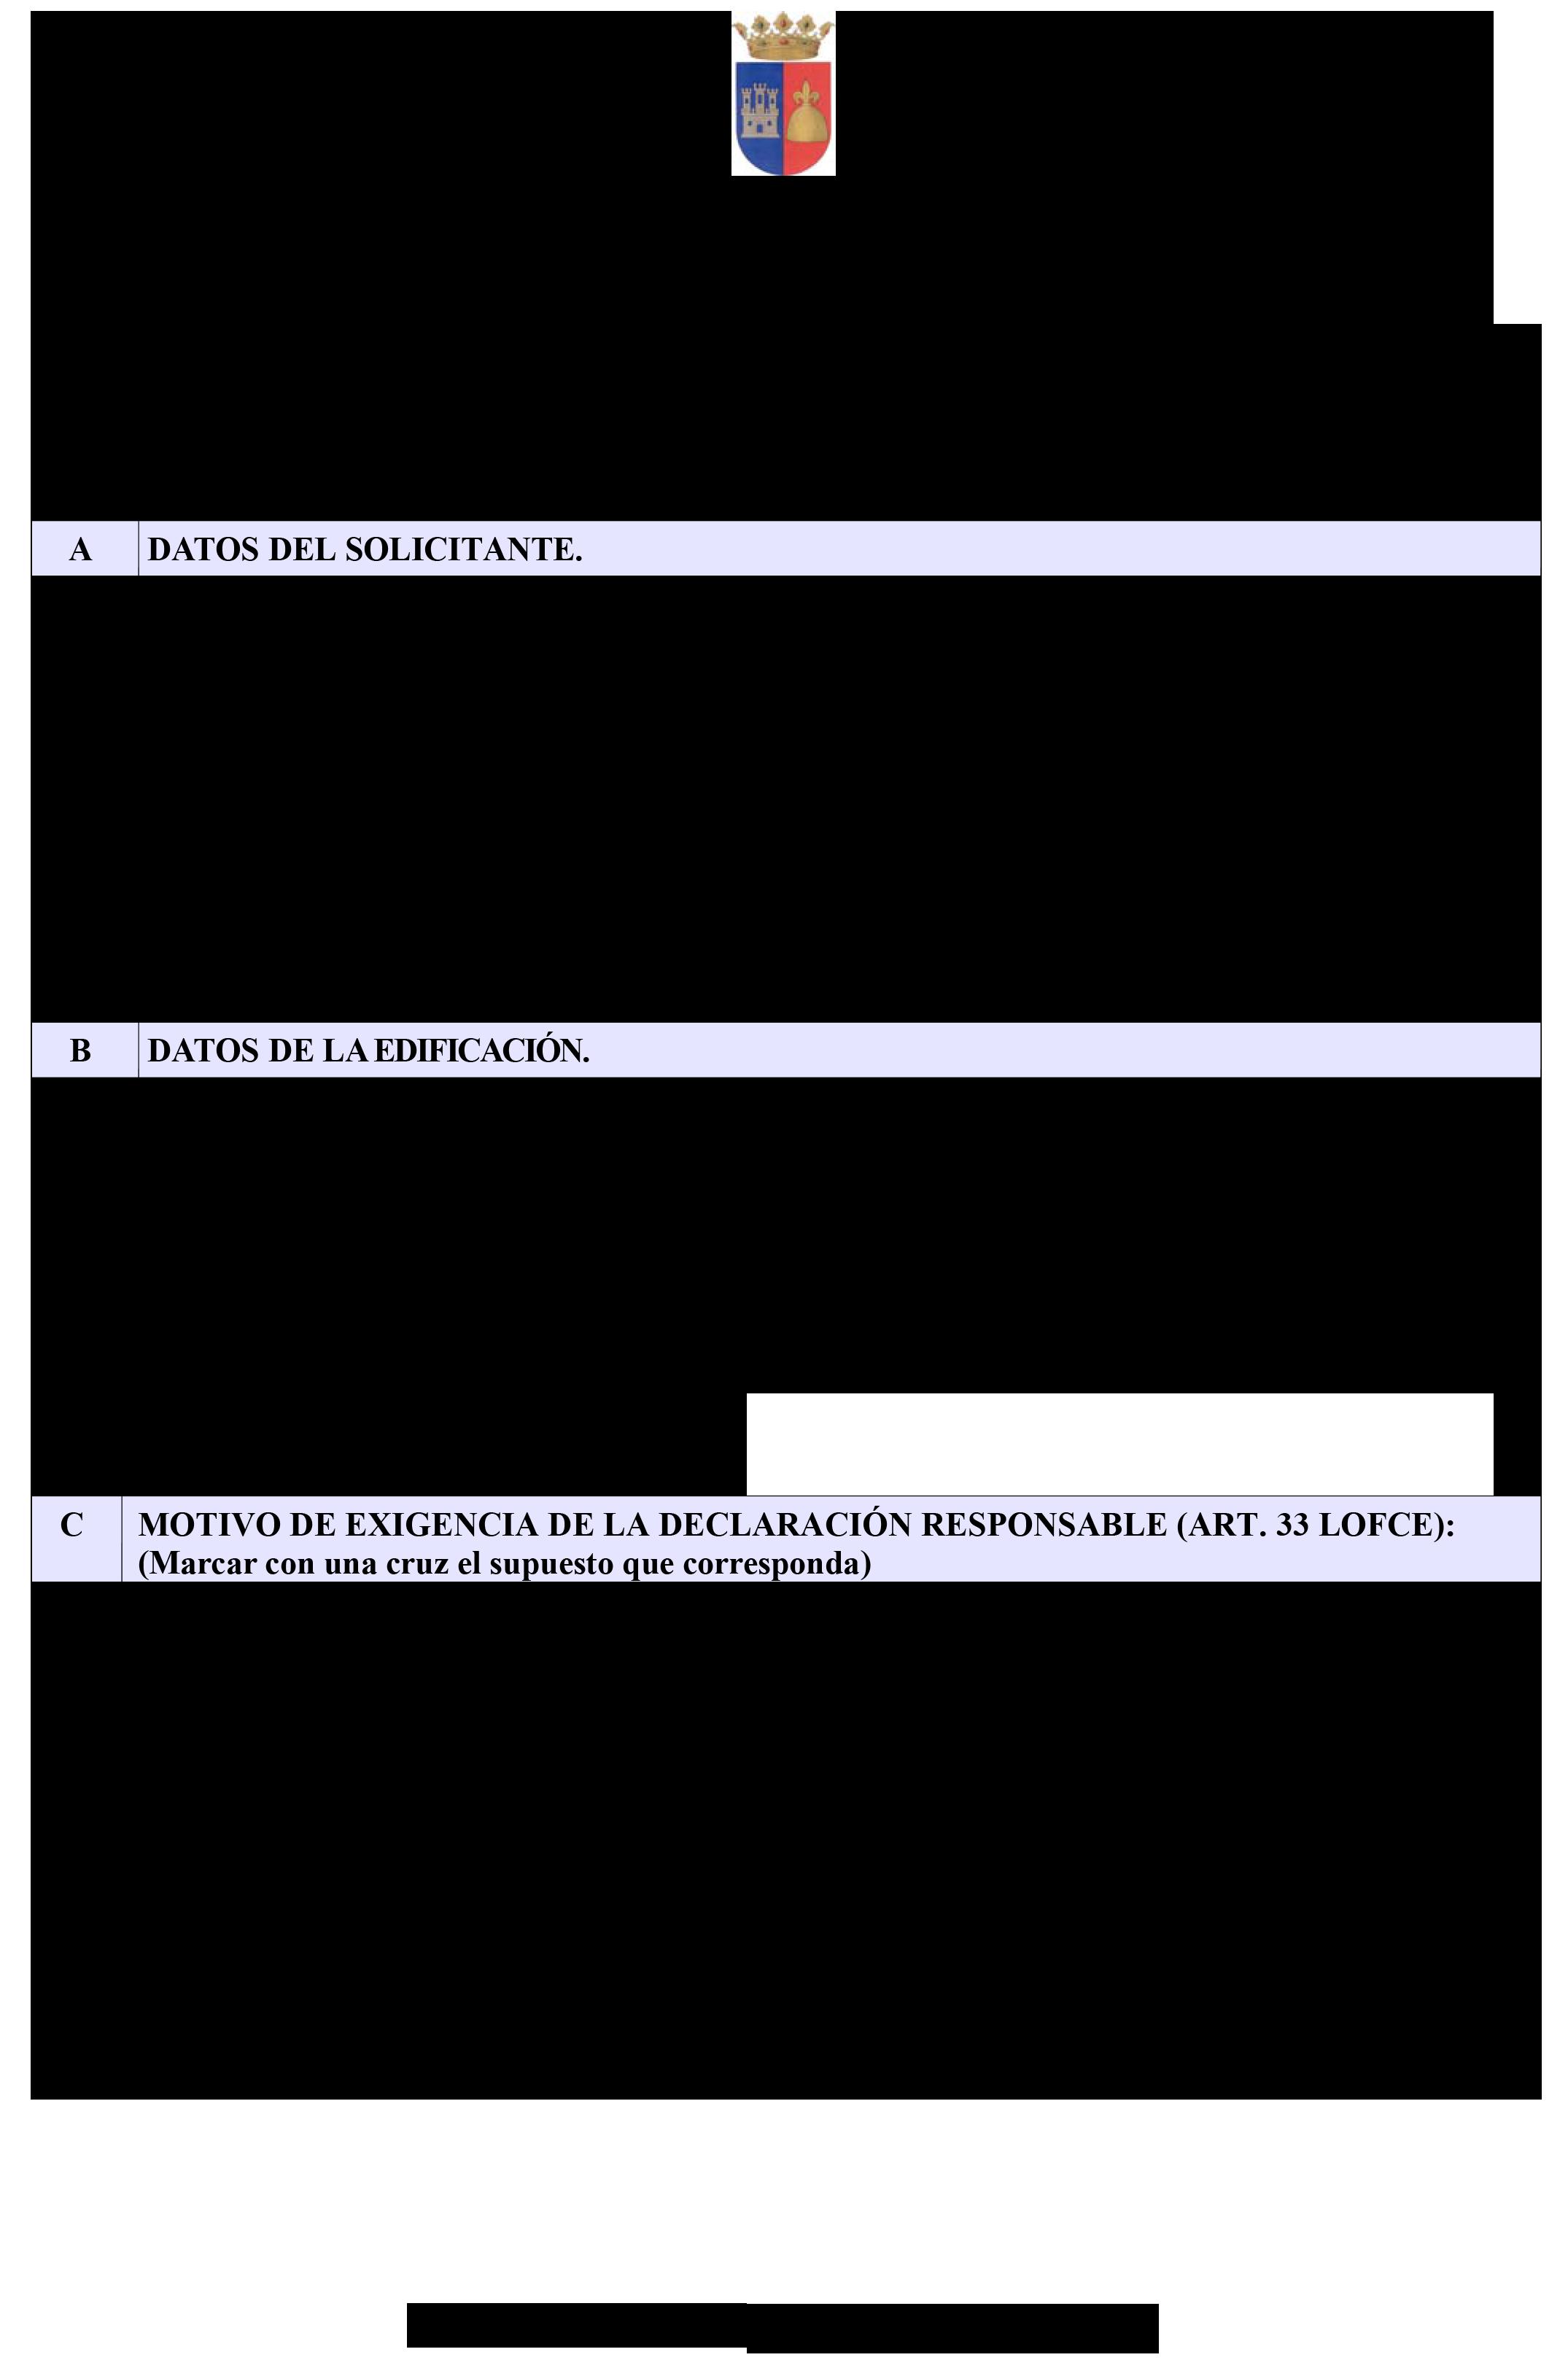 declaracion_responsable_segunda_ocupacion-ESTIVELLA-1